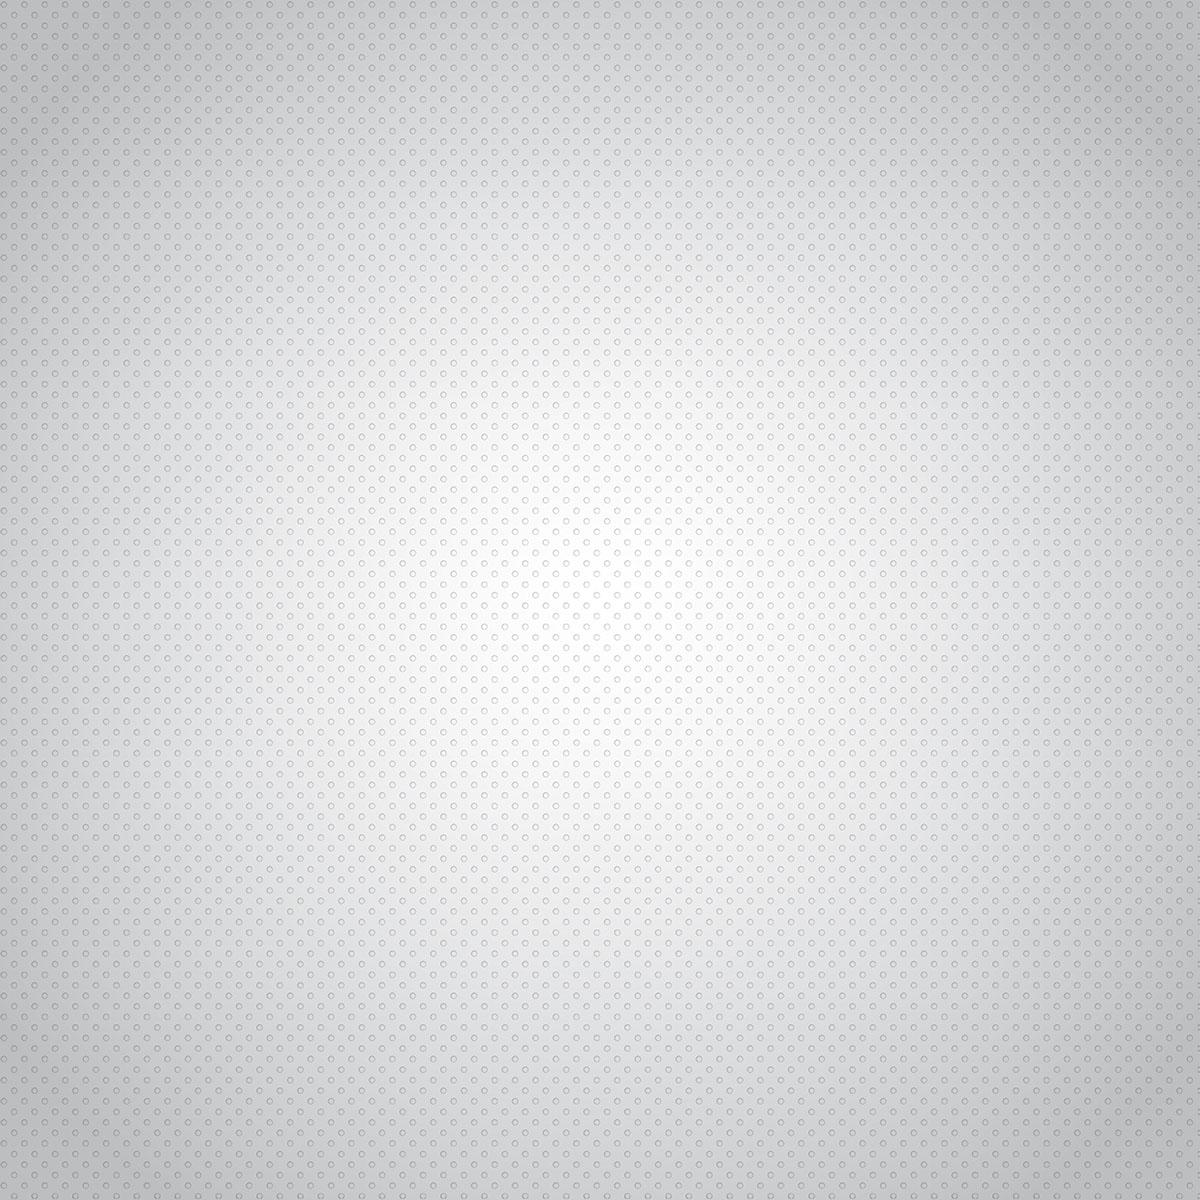 White Metallic Texture Background Download Free Vectors Clipart Graphics Vector Art